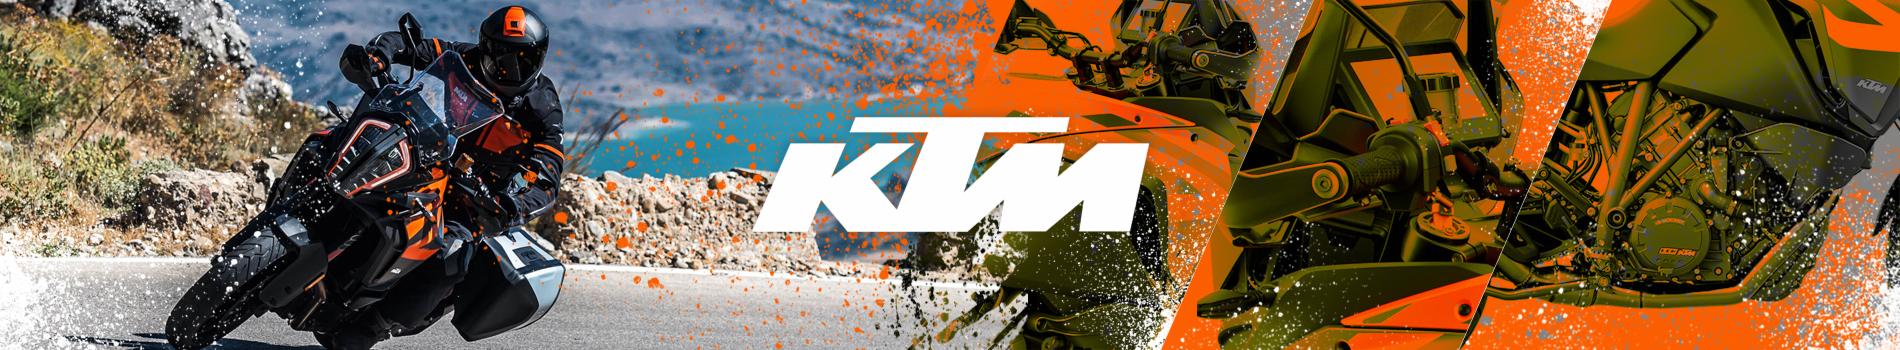 Motocicletas KTM